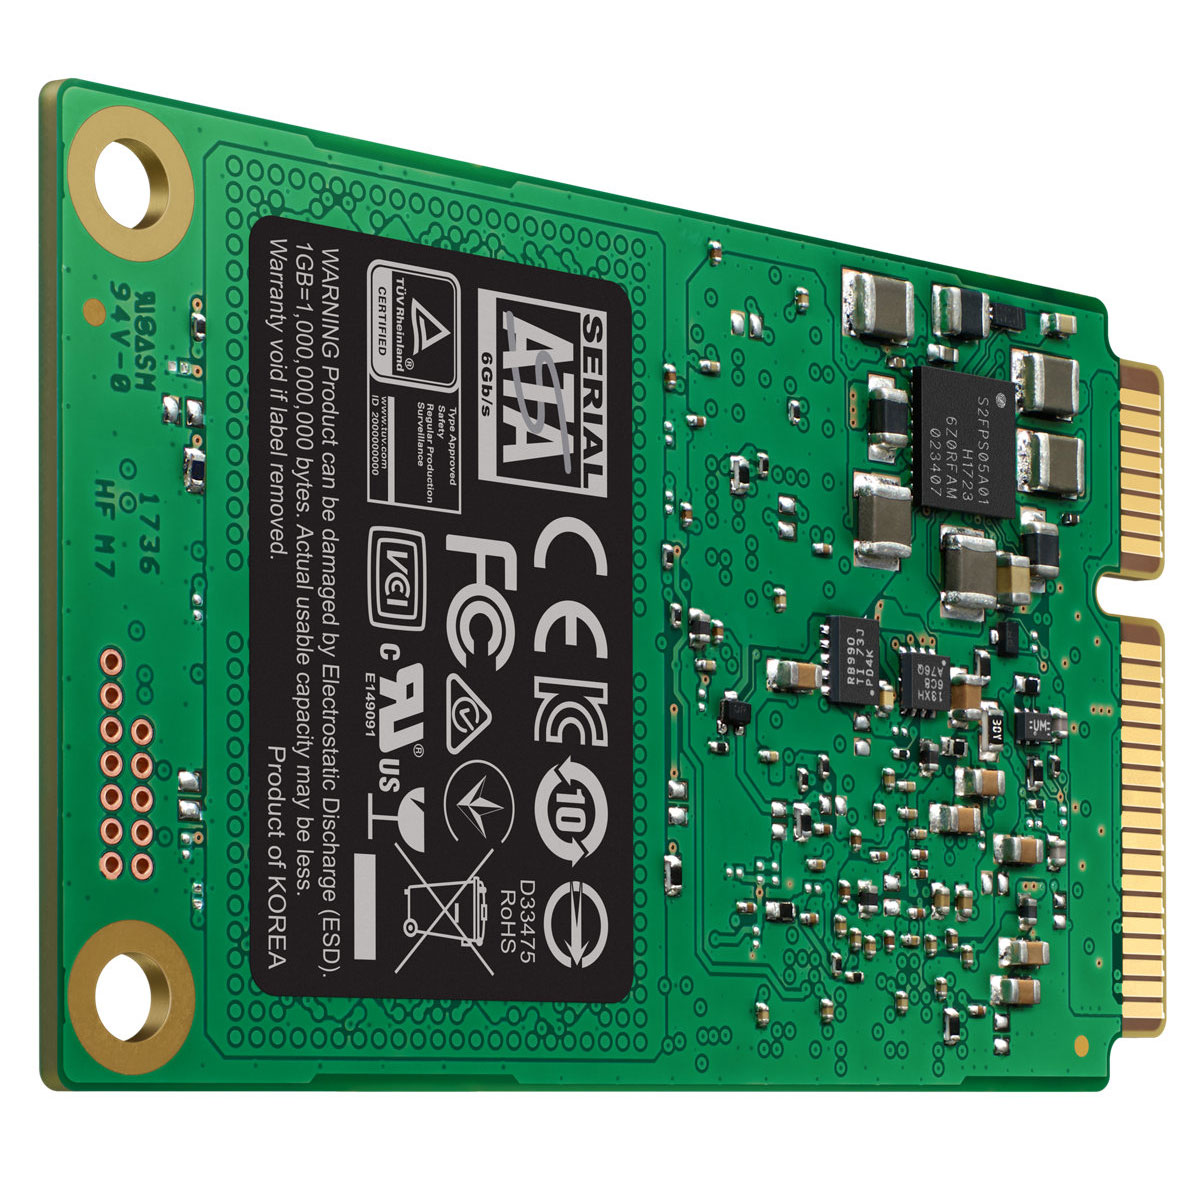 Samsung 860 EVO 480-525Go - Disque SSD Samsung - Cybertek.fr - 1